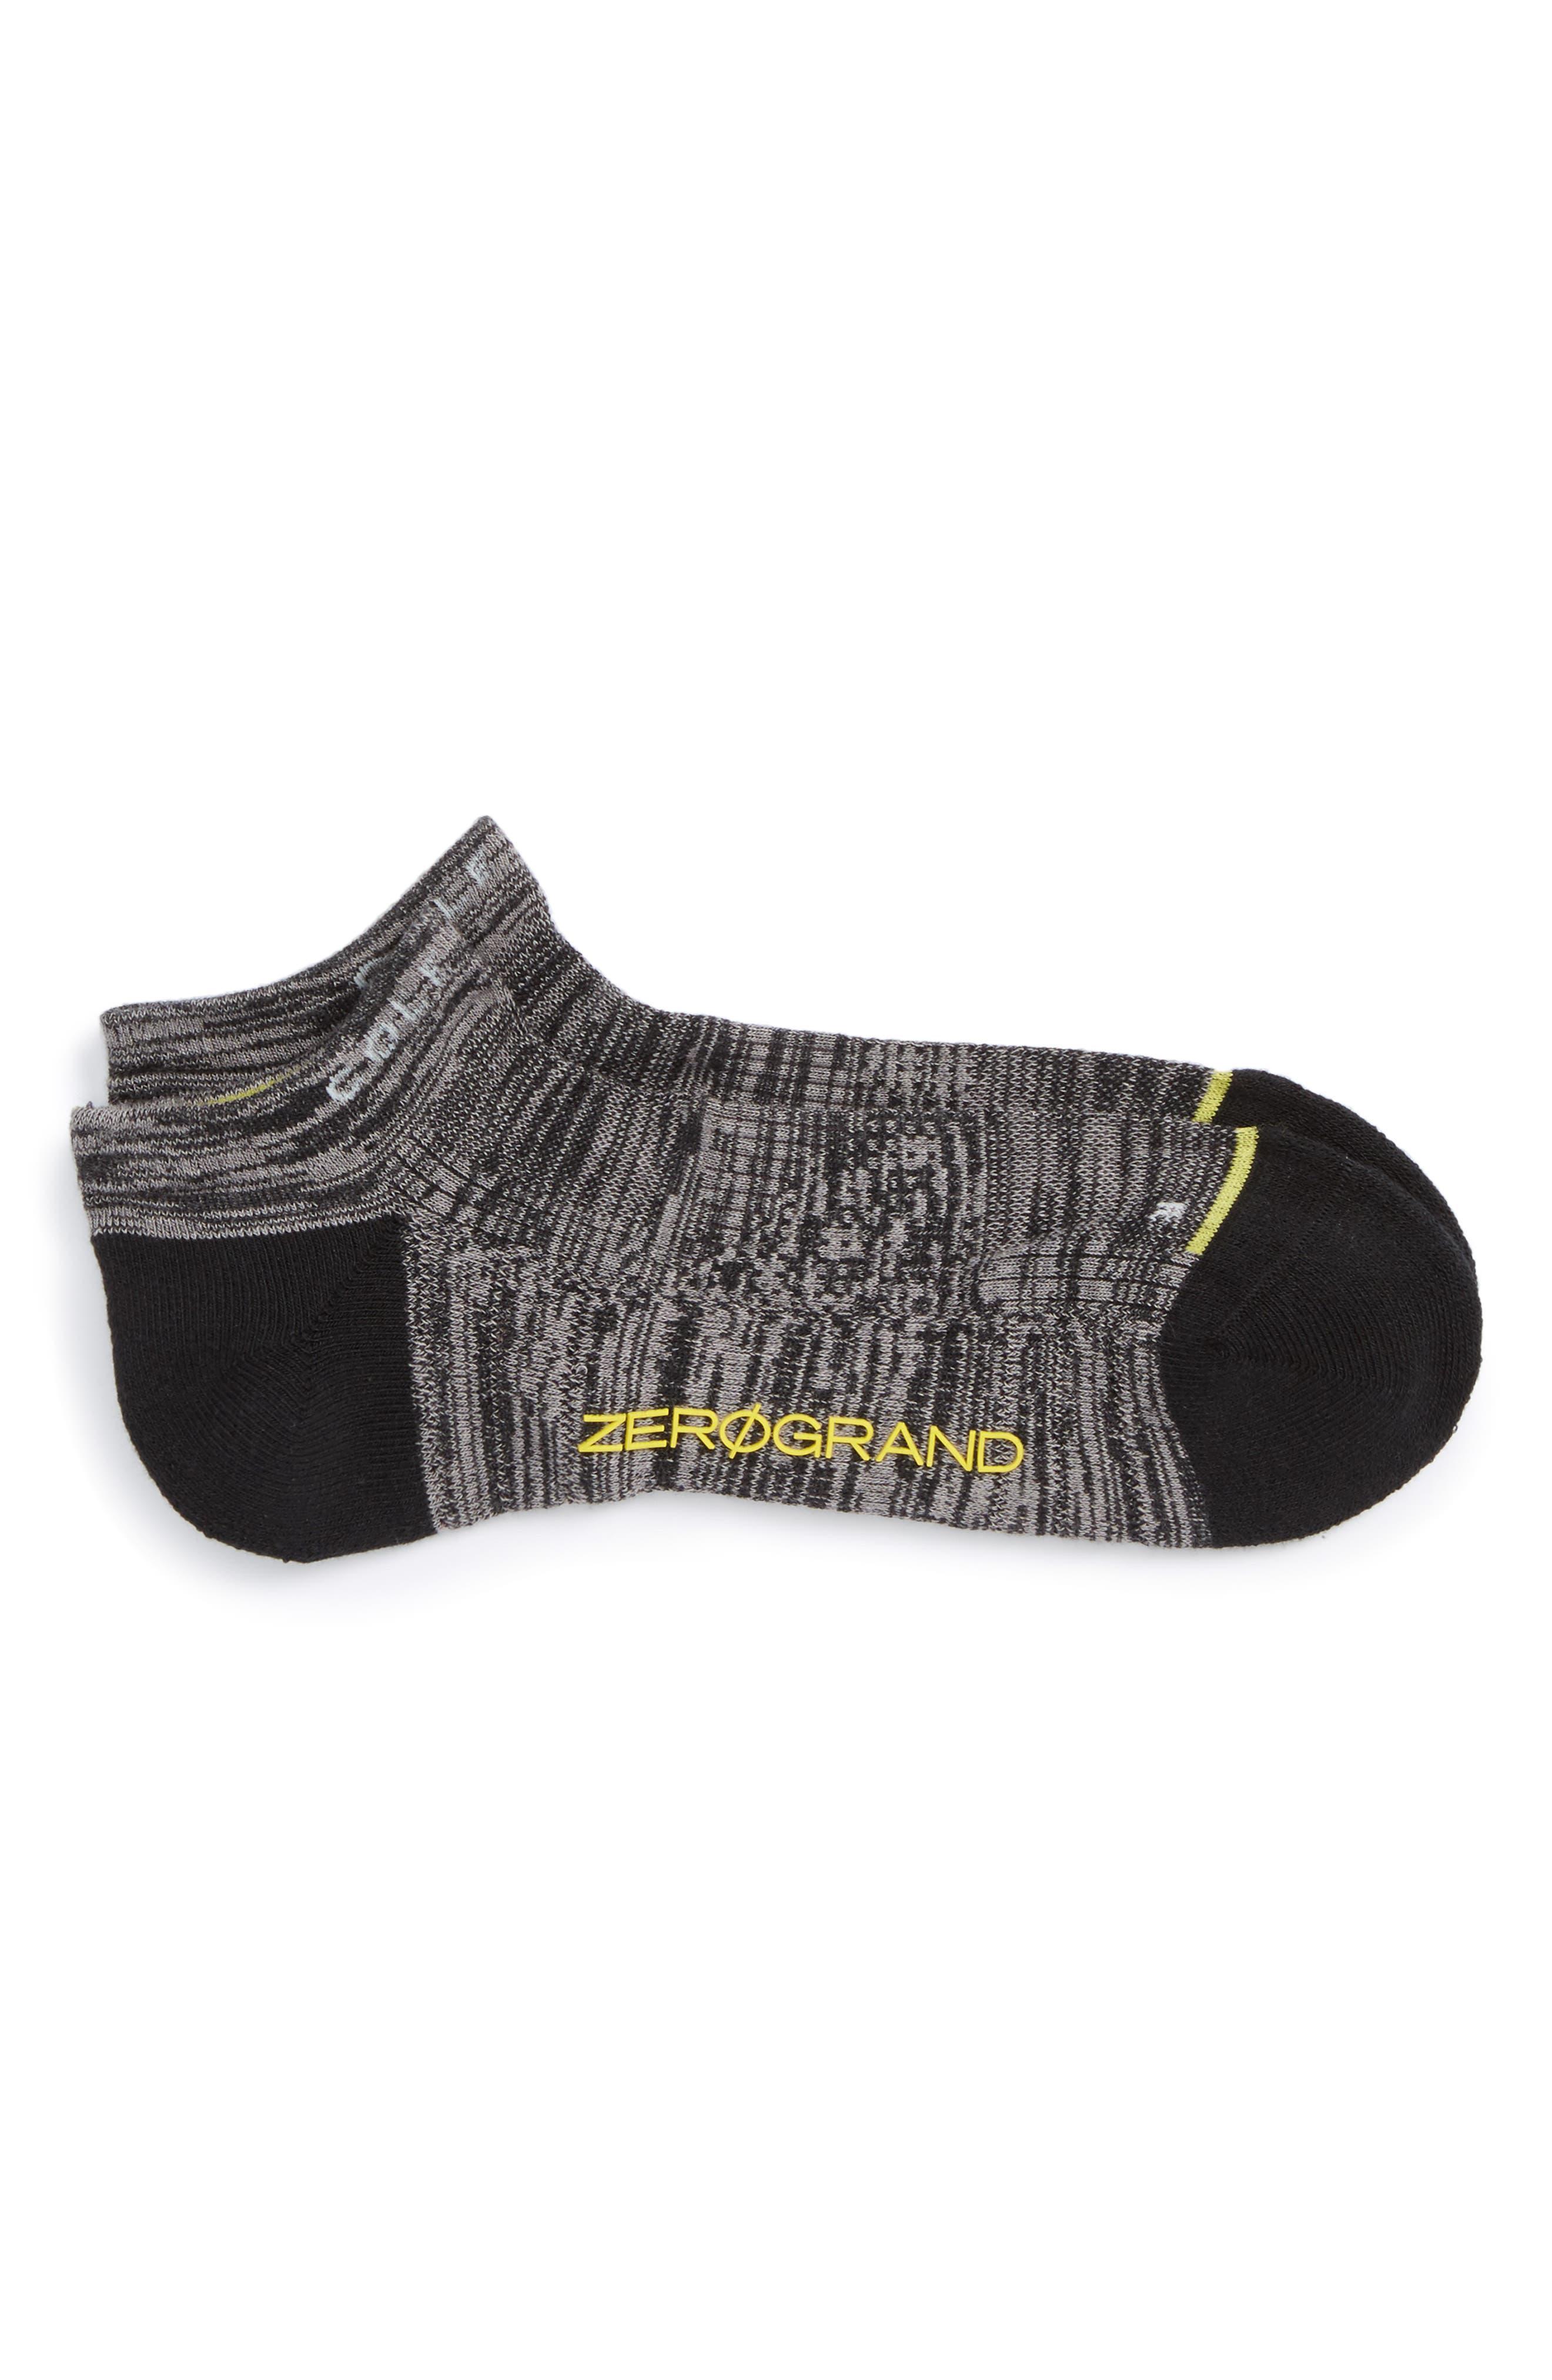 Alternate Image 1 Selected - Cole Haan ZeroGrand Liner Socks